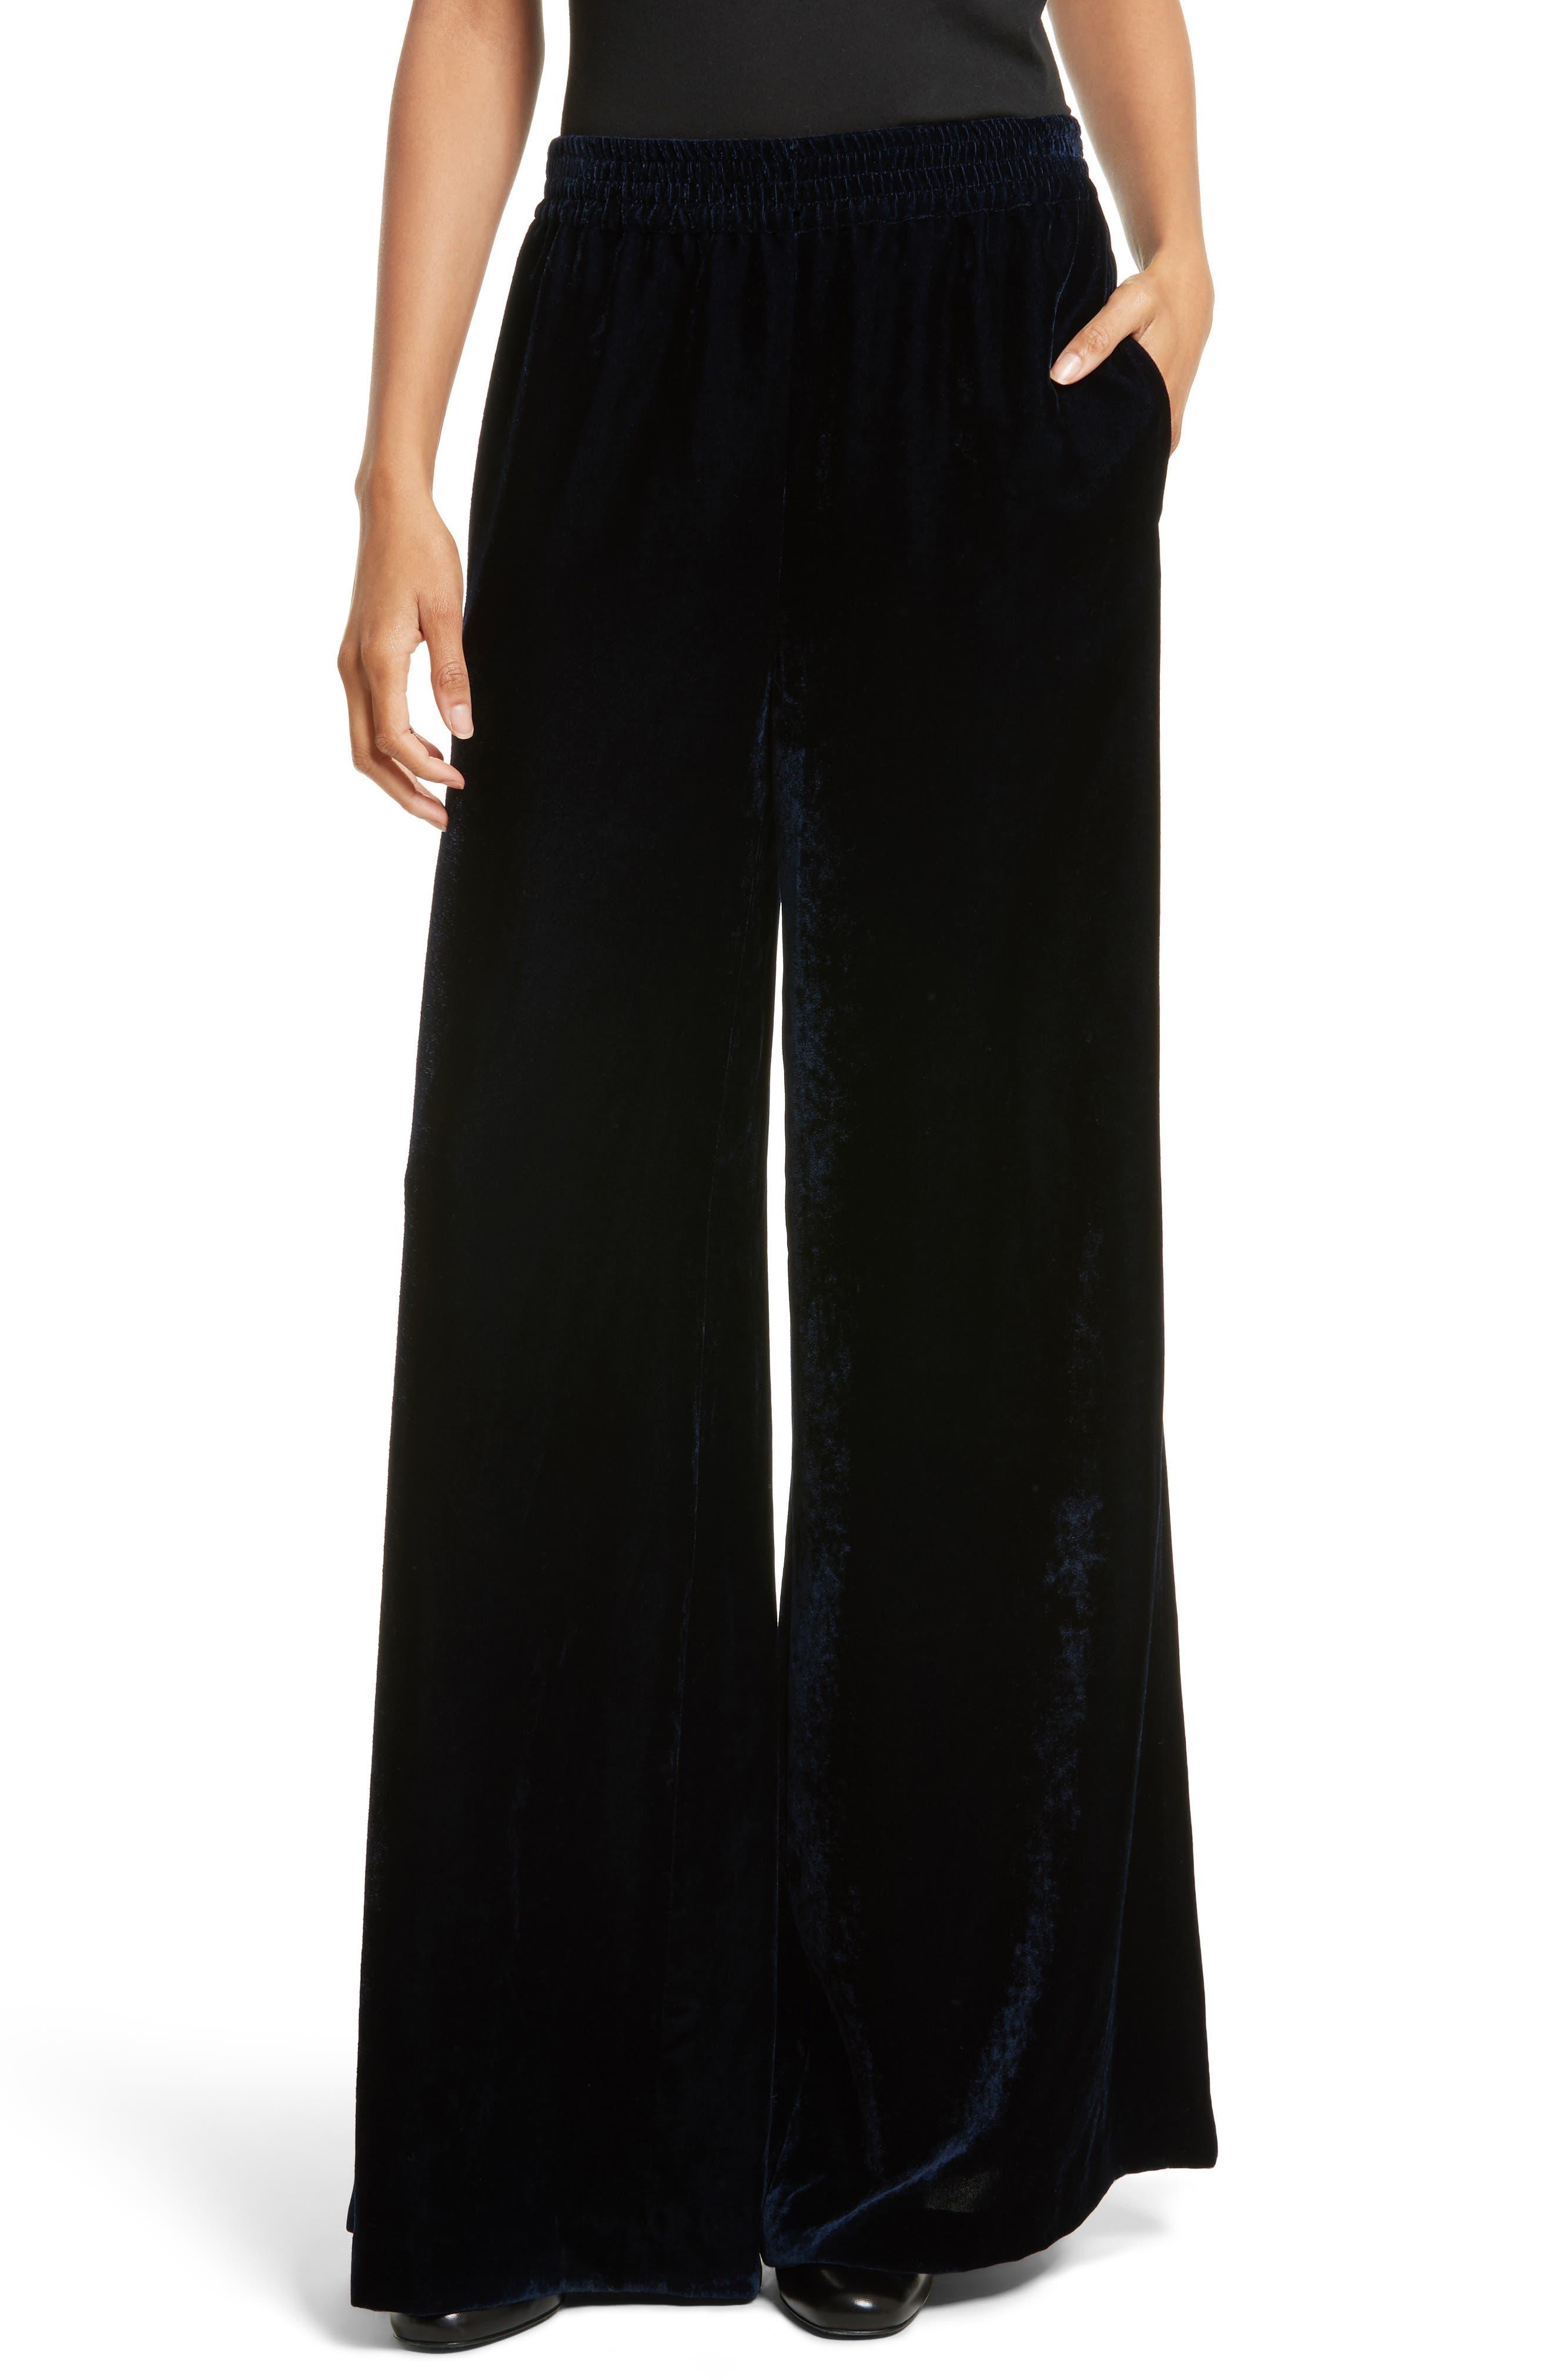 Alternate Image 1 Selected - Nili Lotan Harlow Sandwashed Velvet Pants